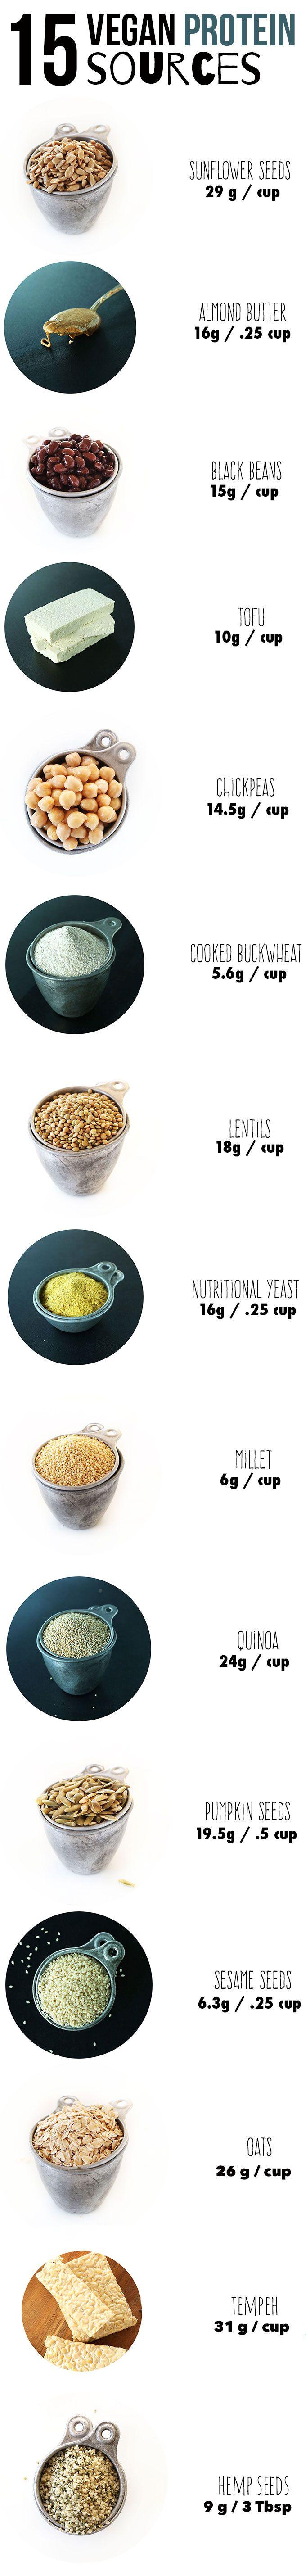 15 clean, healthy vegan or #vegetarian protein sources with grams per Serving. #plantbased diet